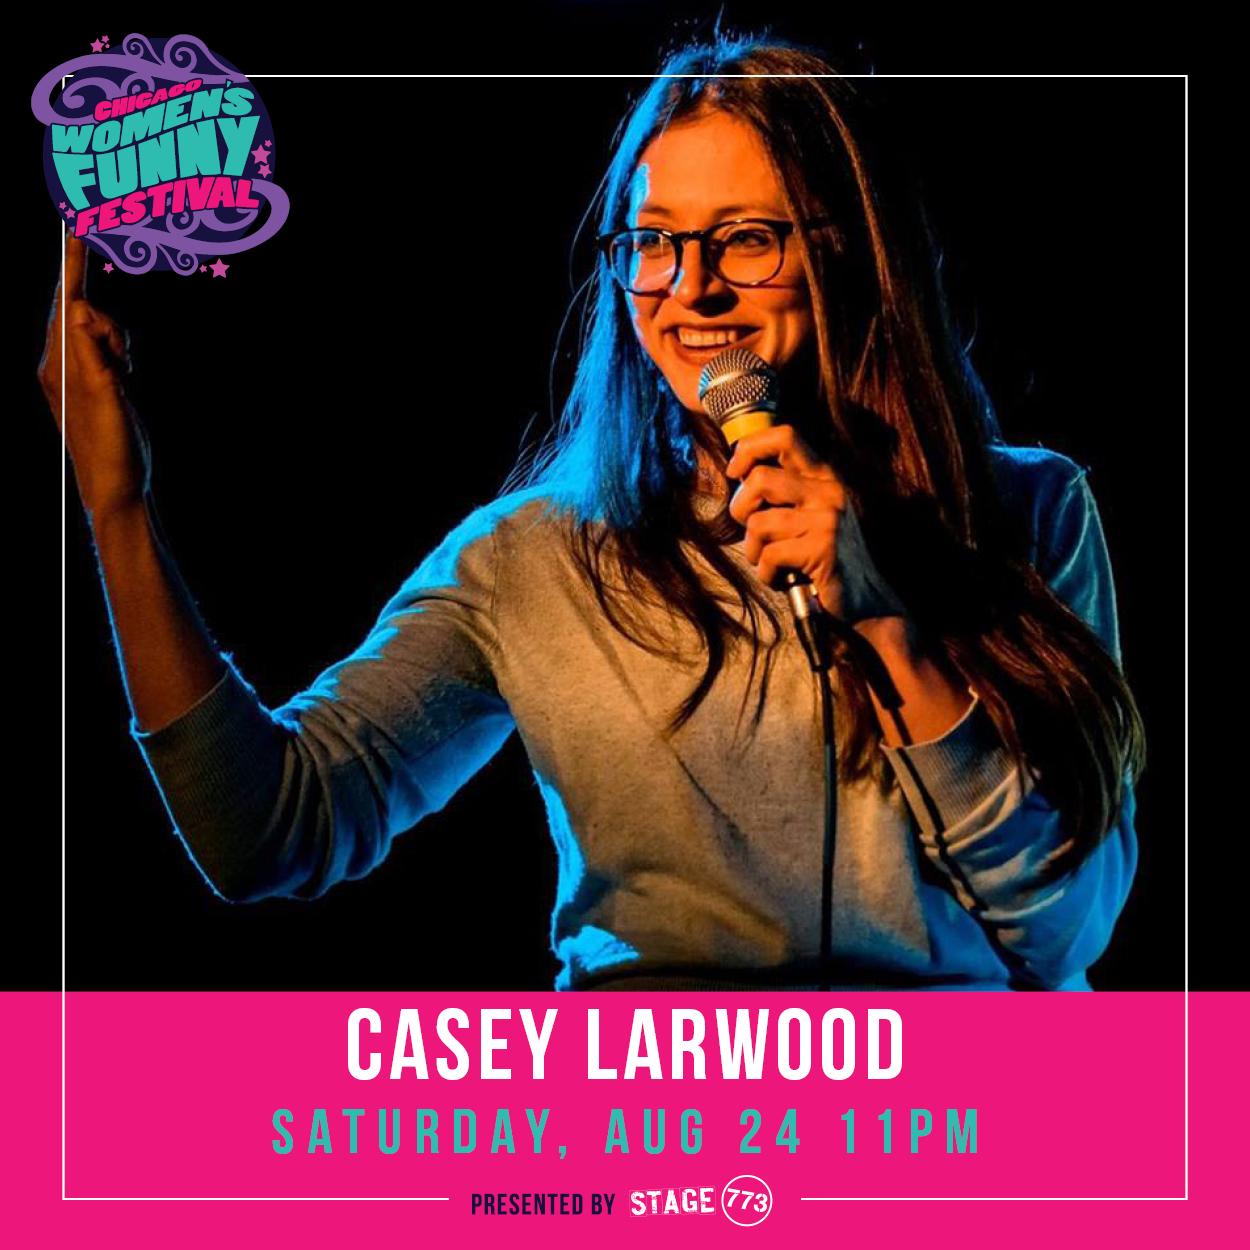 CaseyLarwood_Saturday_11PM_CWFF2019.jpg